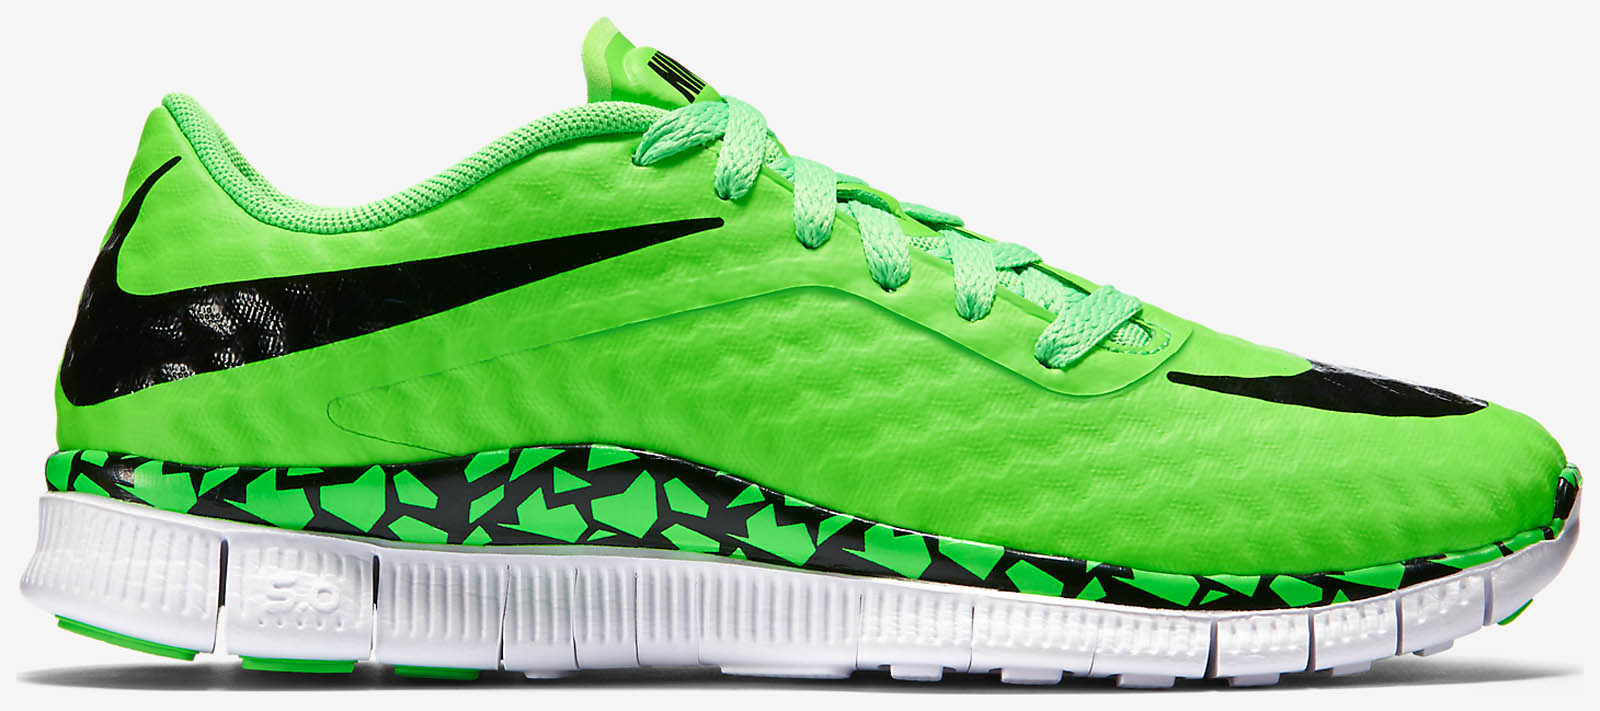 Nike Footwear for Men: Buy Nike Shoes, Sports Shoes, Sneakers